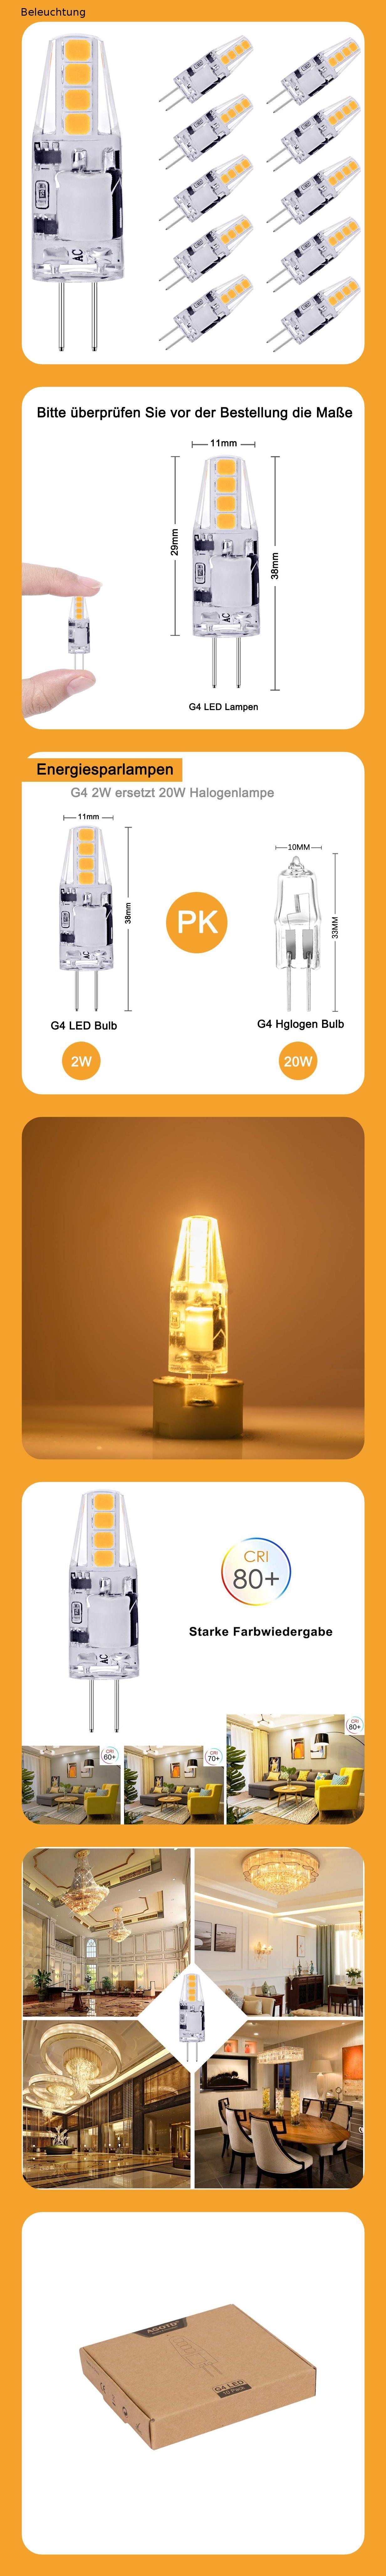 Agotd G4 Led Lampen 2w Led Birnen Ersetzt 20w Halogenlampen 3000k Warmweiss 160lm 12v Ac Dc Led Leuchtmittel 360 Grad G4 Led Birne In 2020 Led Birnen Led Lampe Led